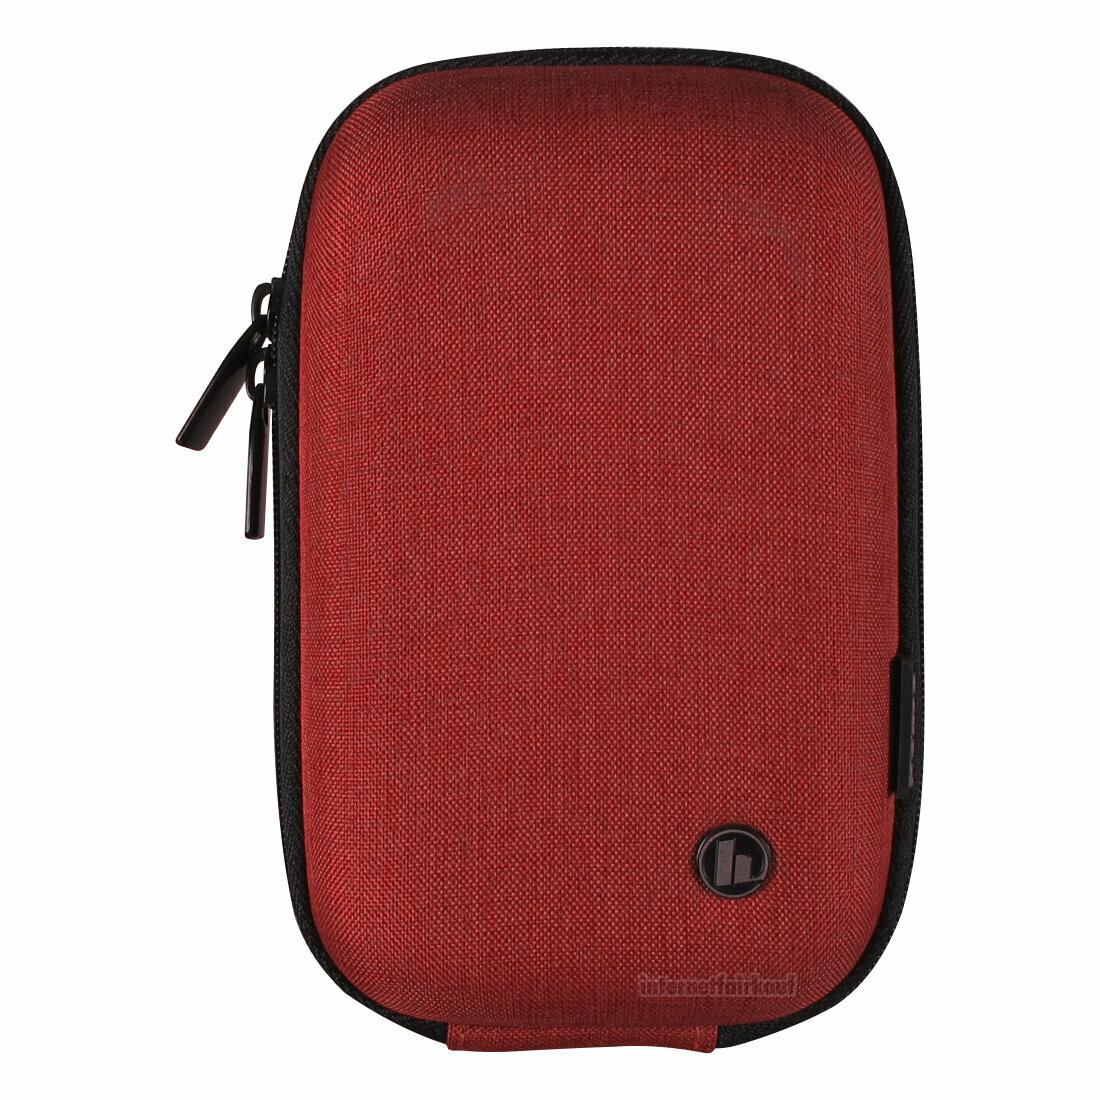 Hama Hardcase Fototasche rot passend für Ricoh WG-60 WG-70